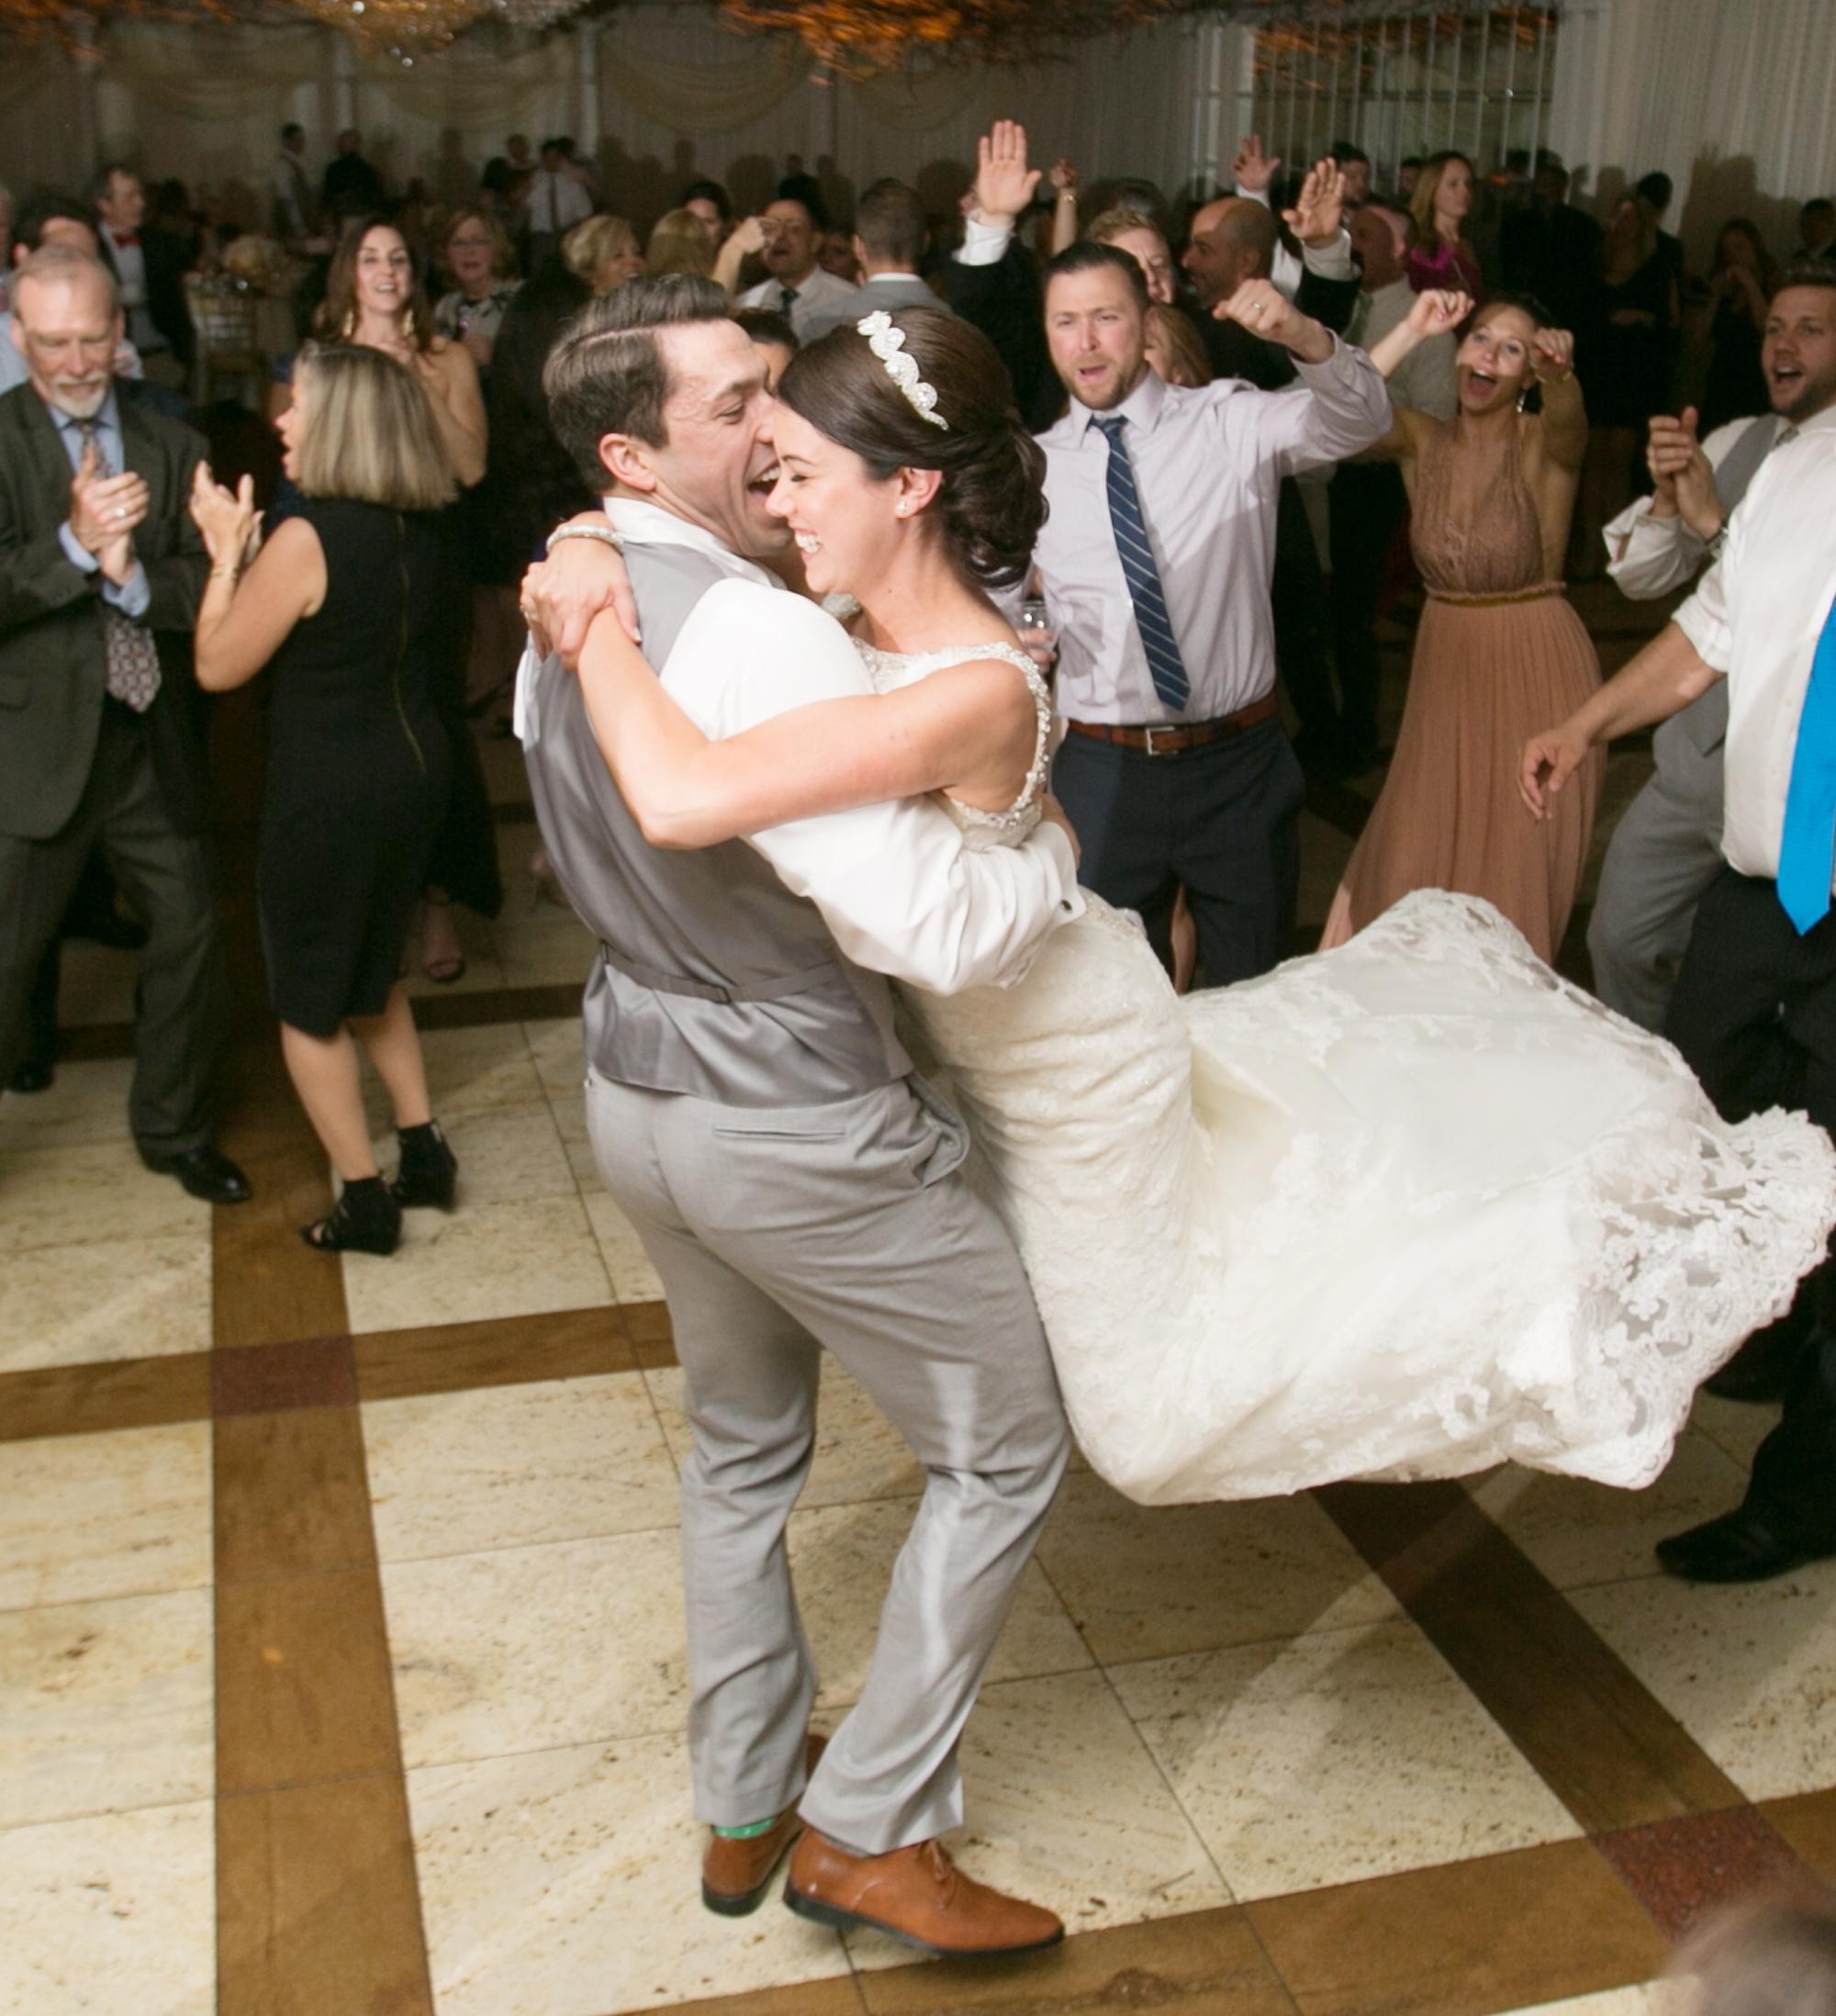 Wedding Song Suggestions-First Dance, Parent Dances